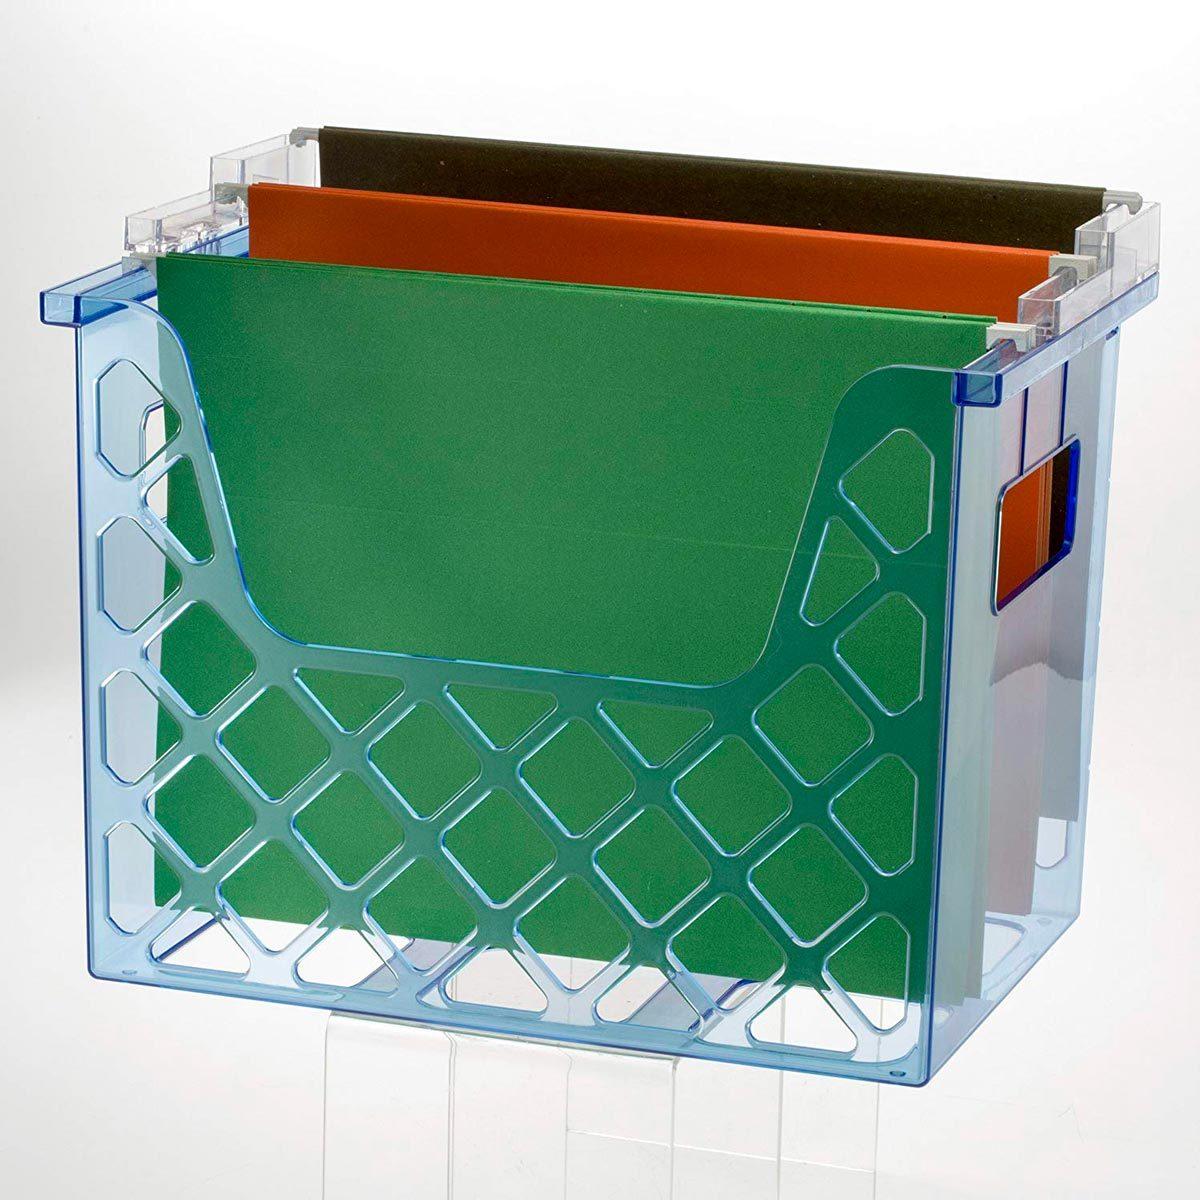 11 File Storage Box Options That Work